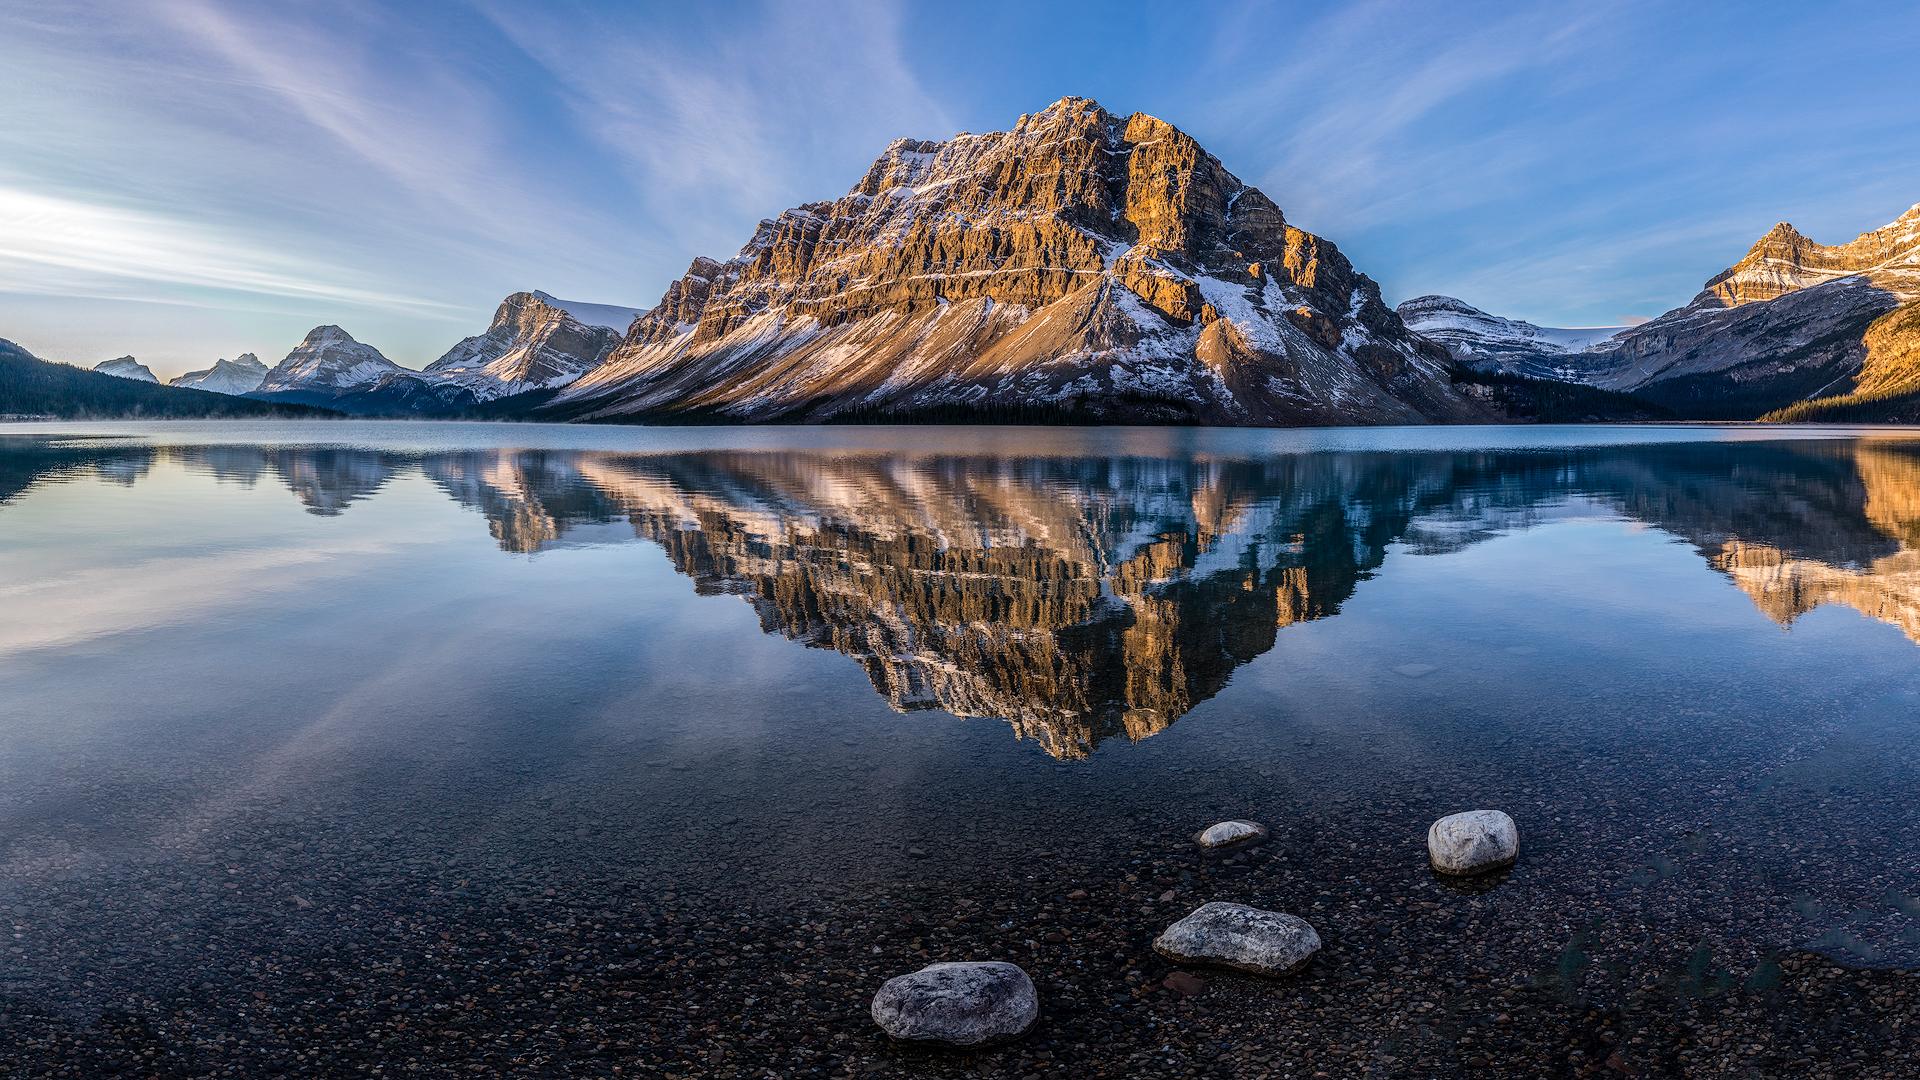 - Image by David Rowlands - Bow Lake